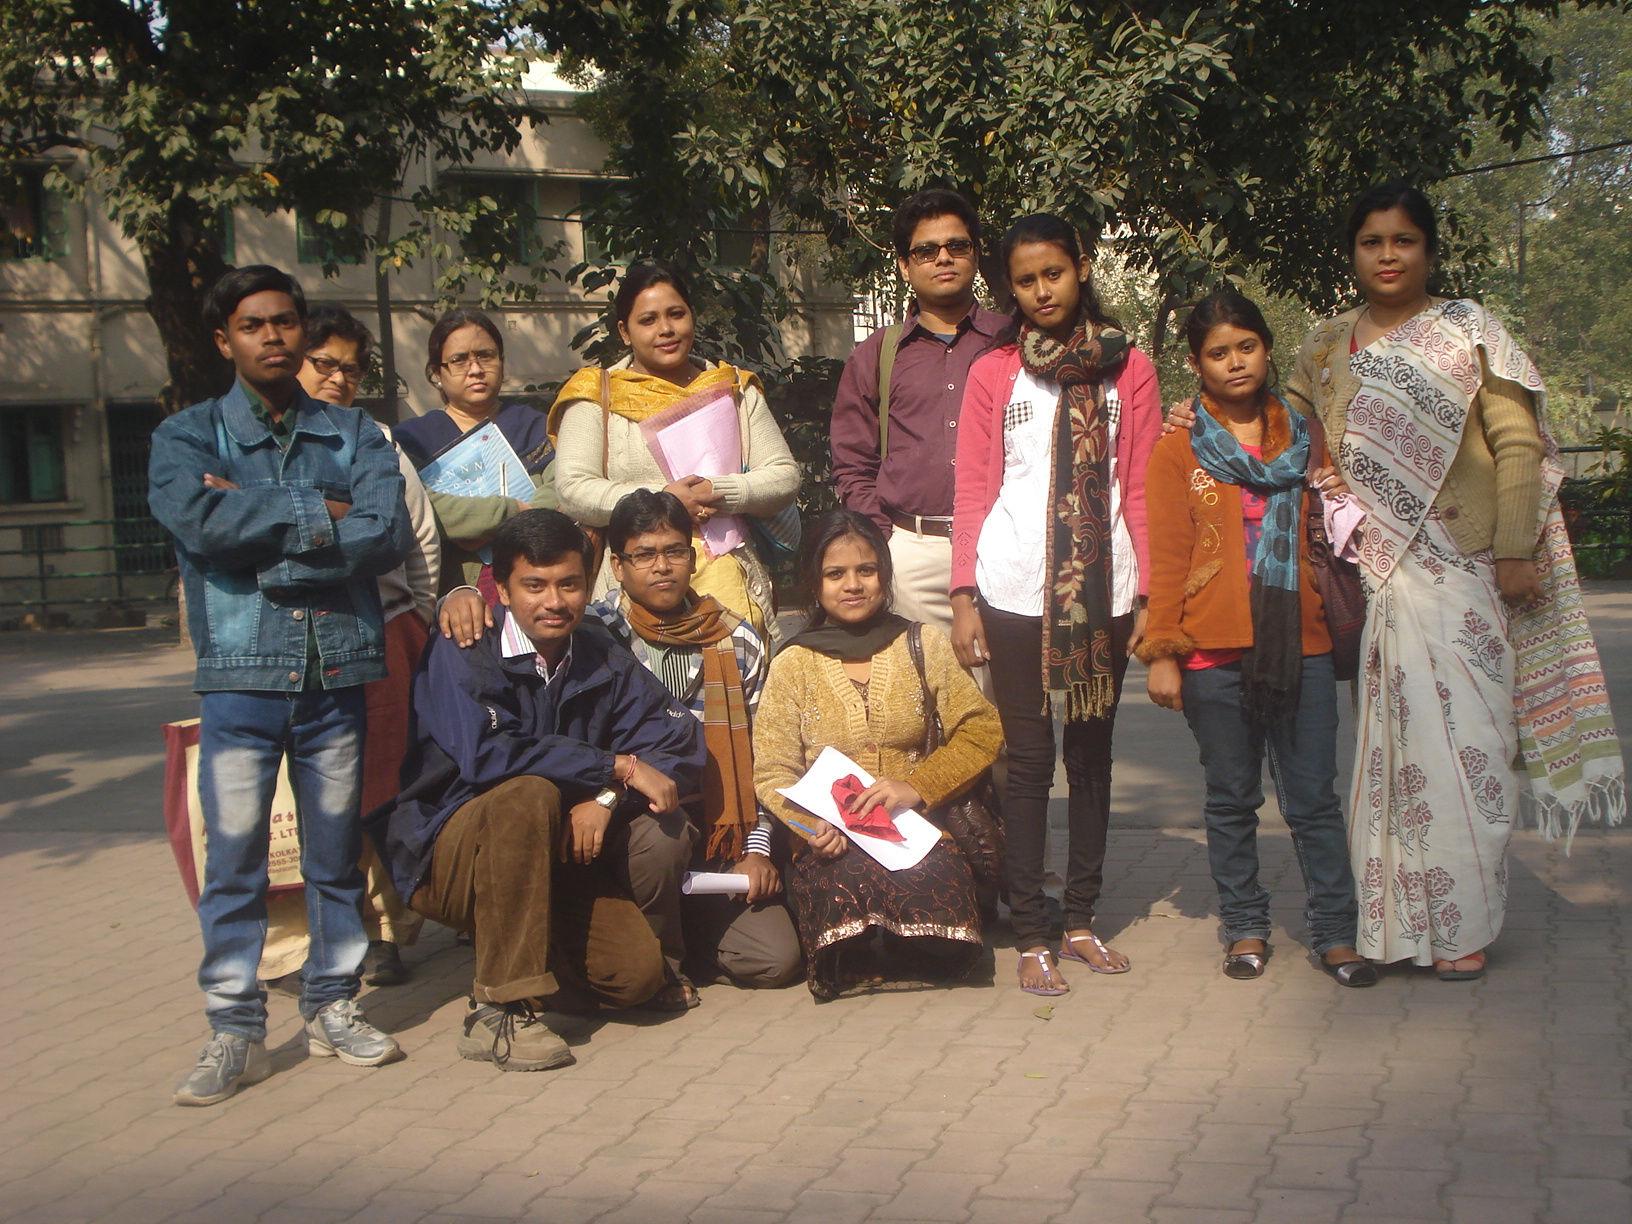 Khudiram Bose Central College Kolkata